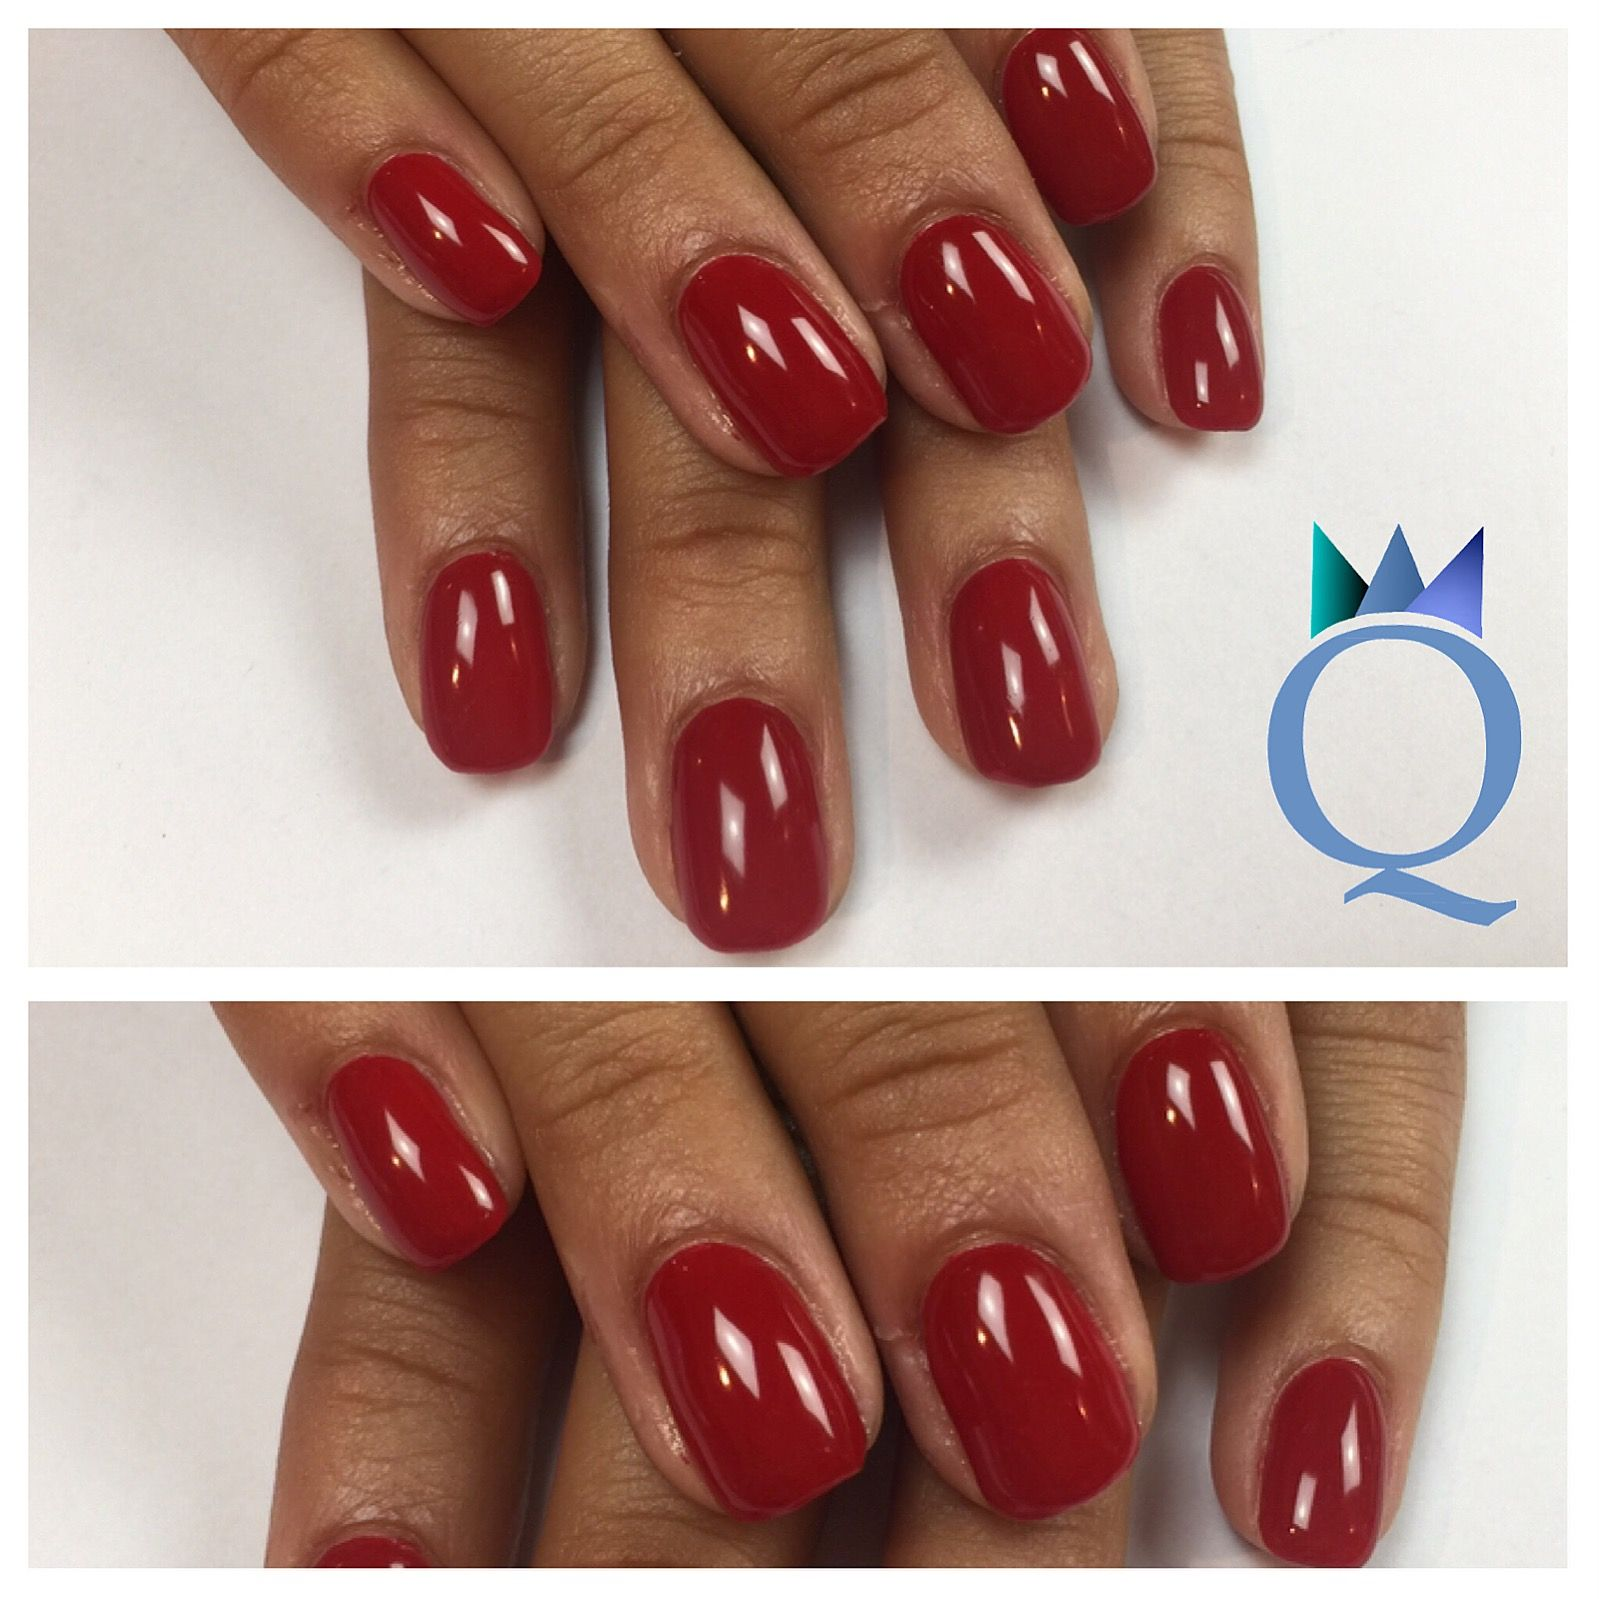 Faszinierend Nageldesign Rot Ideen Von #shortnails #gelnails #nails #red #kurzenägel #gelnägel #nägel